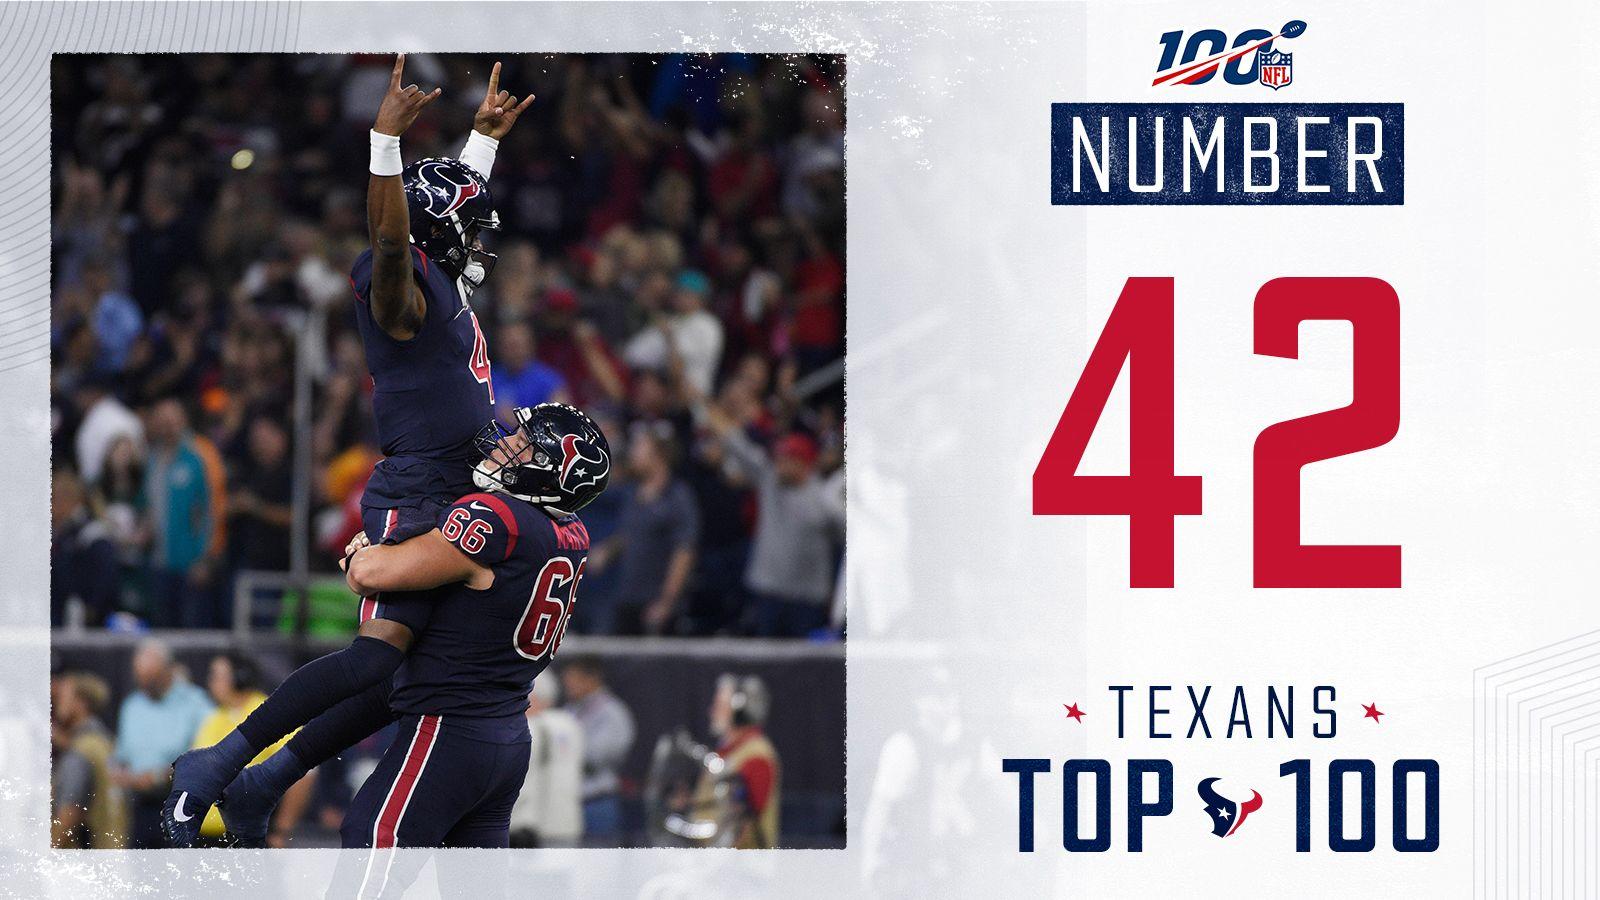 42_Texans win 9 in 2018 - TWITTER